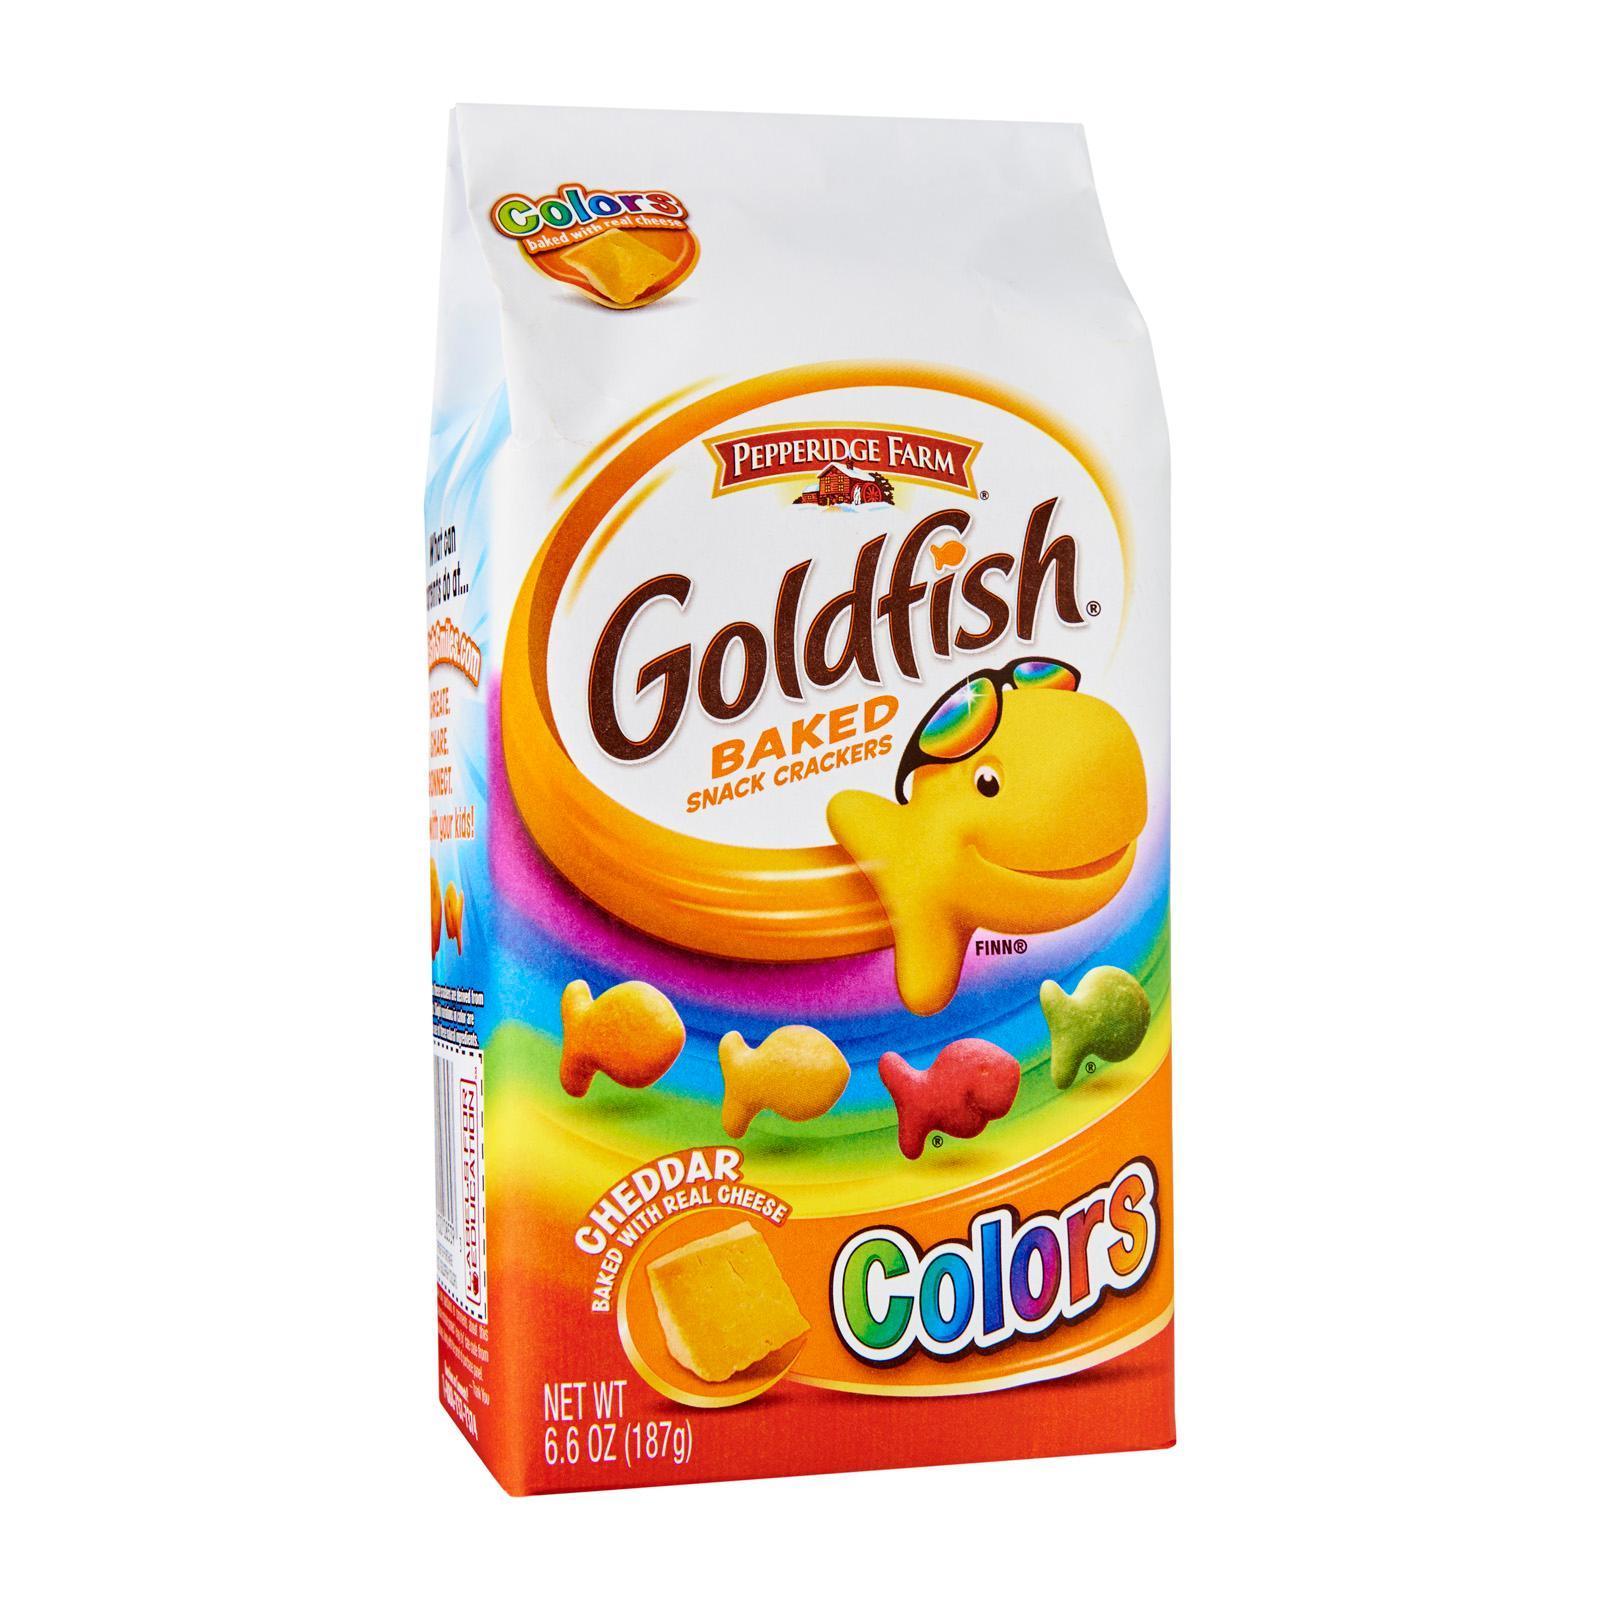 Pepperidge Farm Goldfish Colors Cheddar Baked Crackers